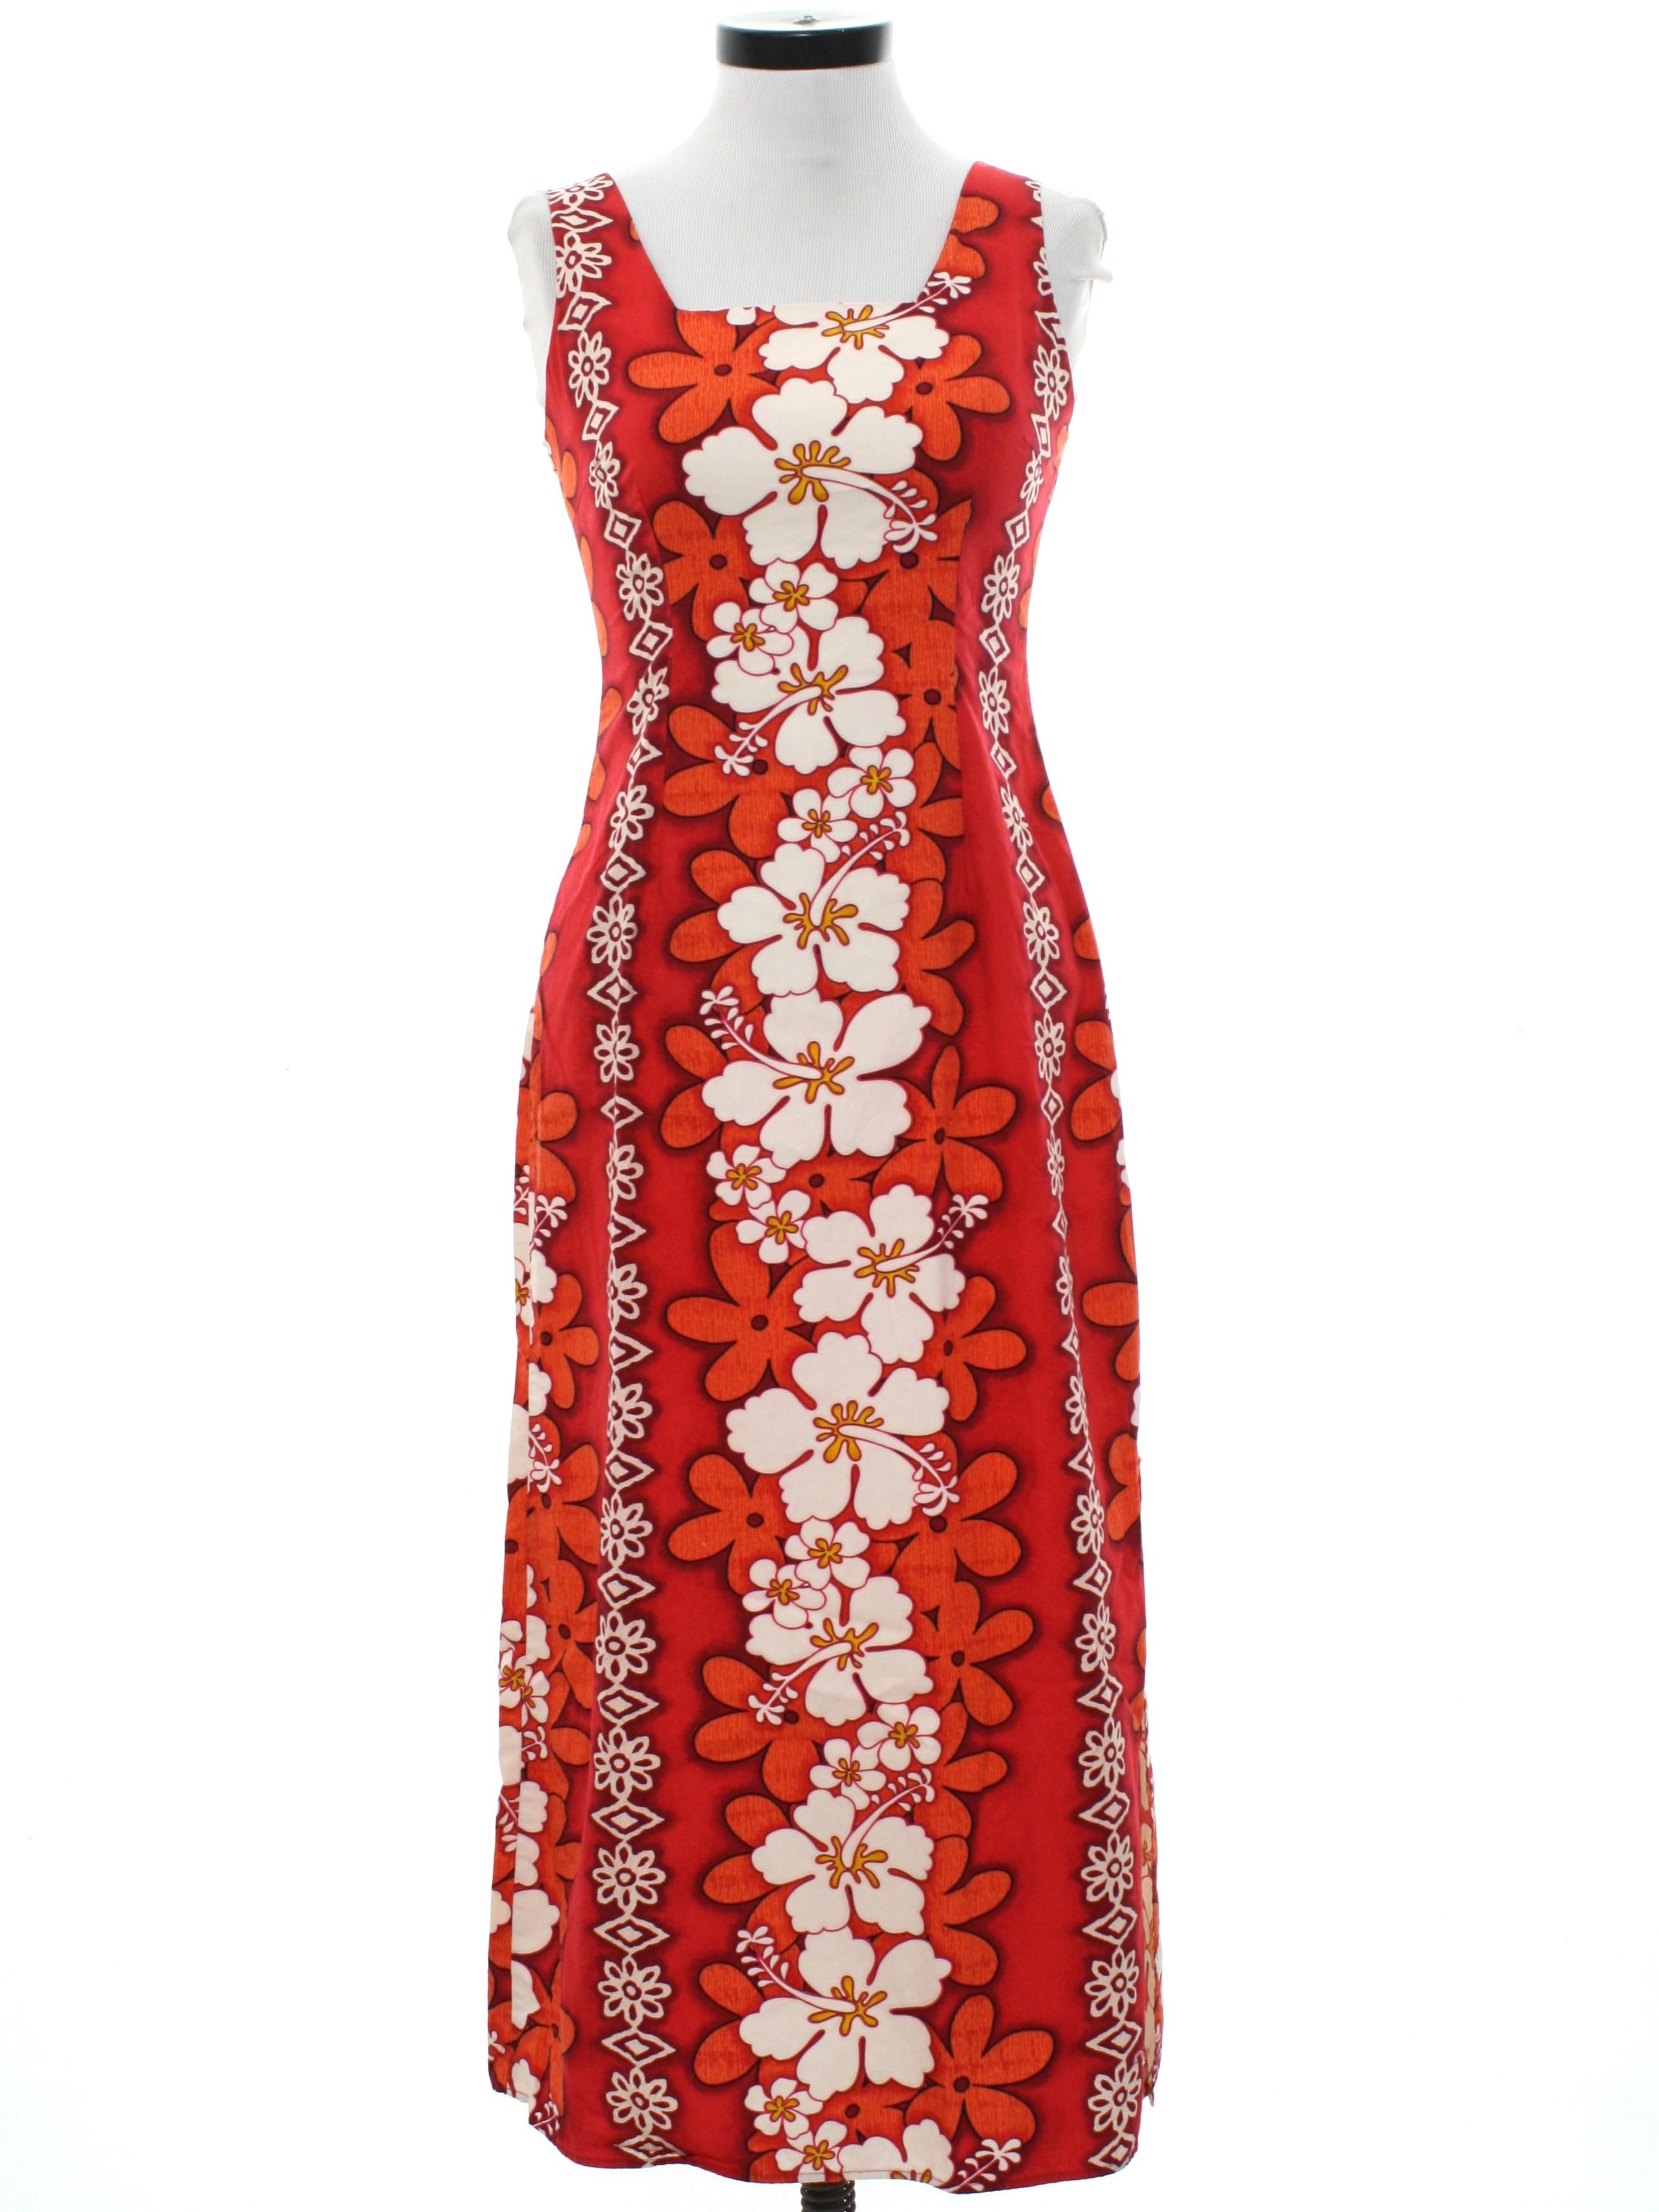 Retro 1980s Hawaiian Dress 80s Royal Creations Petite